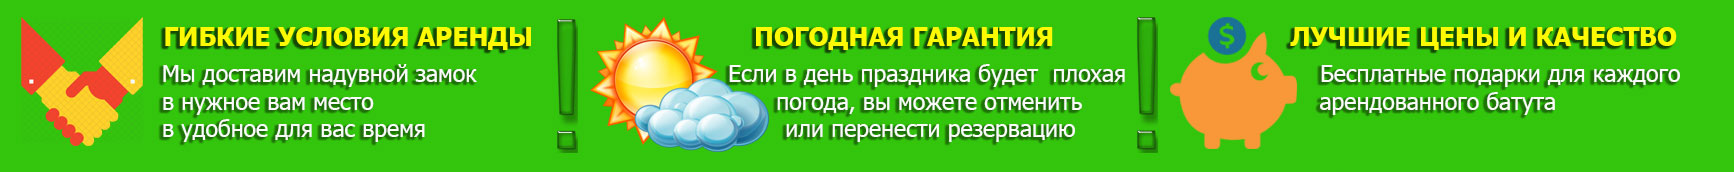 Baneris rus